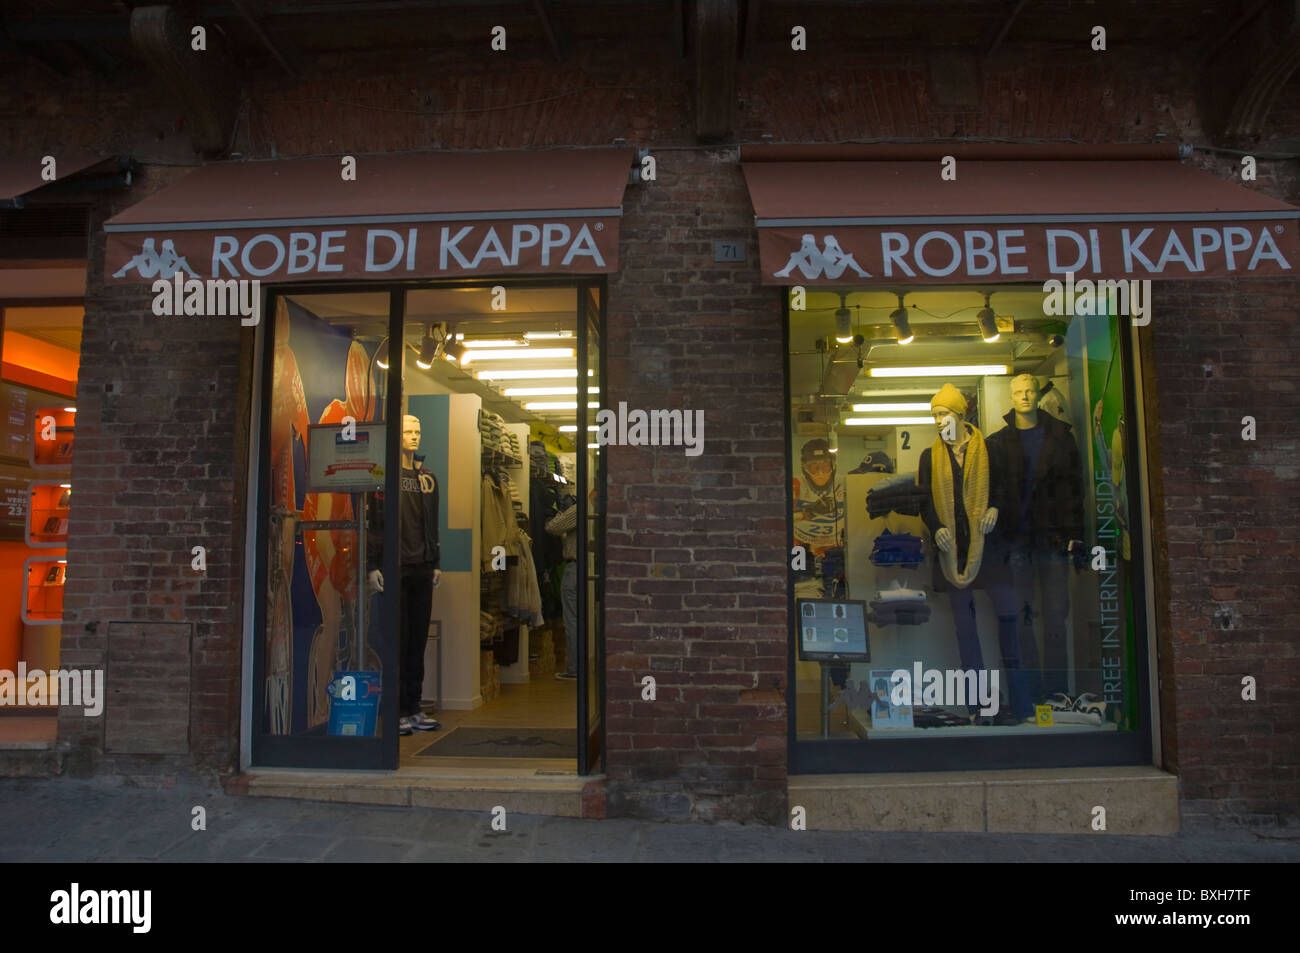 Robe di Kappa shop Siena Toskana Italien-Mitteleuropa Stockbild